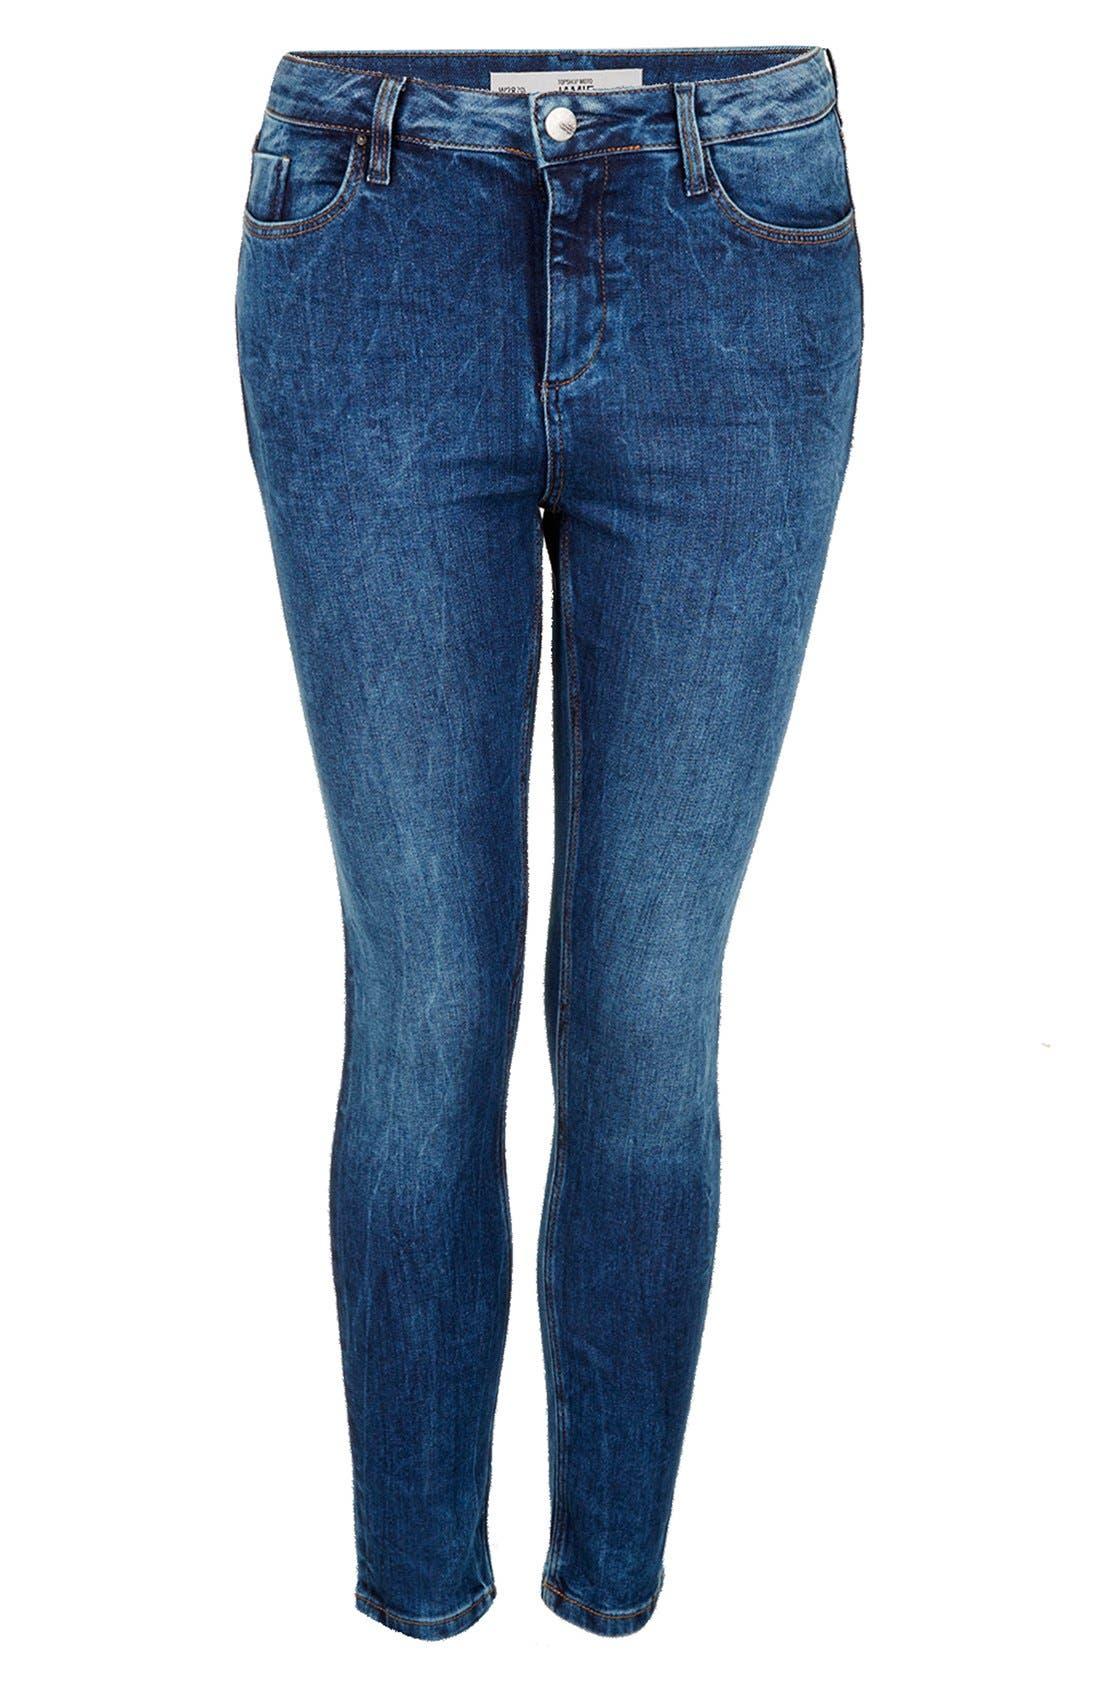 Alternate Image 3  - Topshop 'Jamie' Skinny Jeans (Regular, Short & Long)